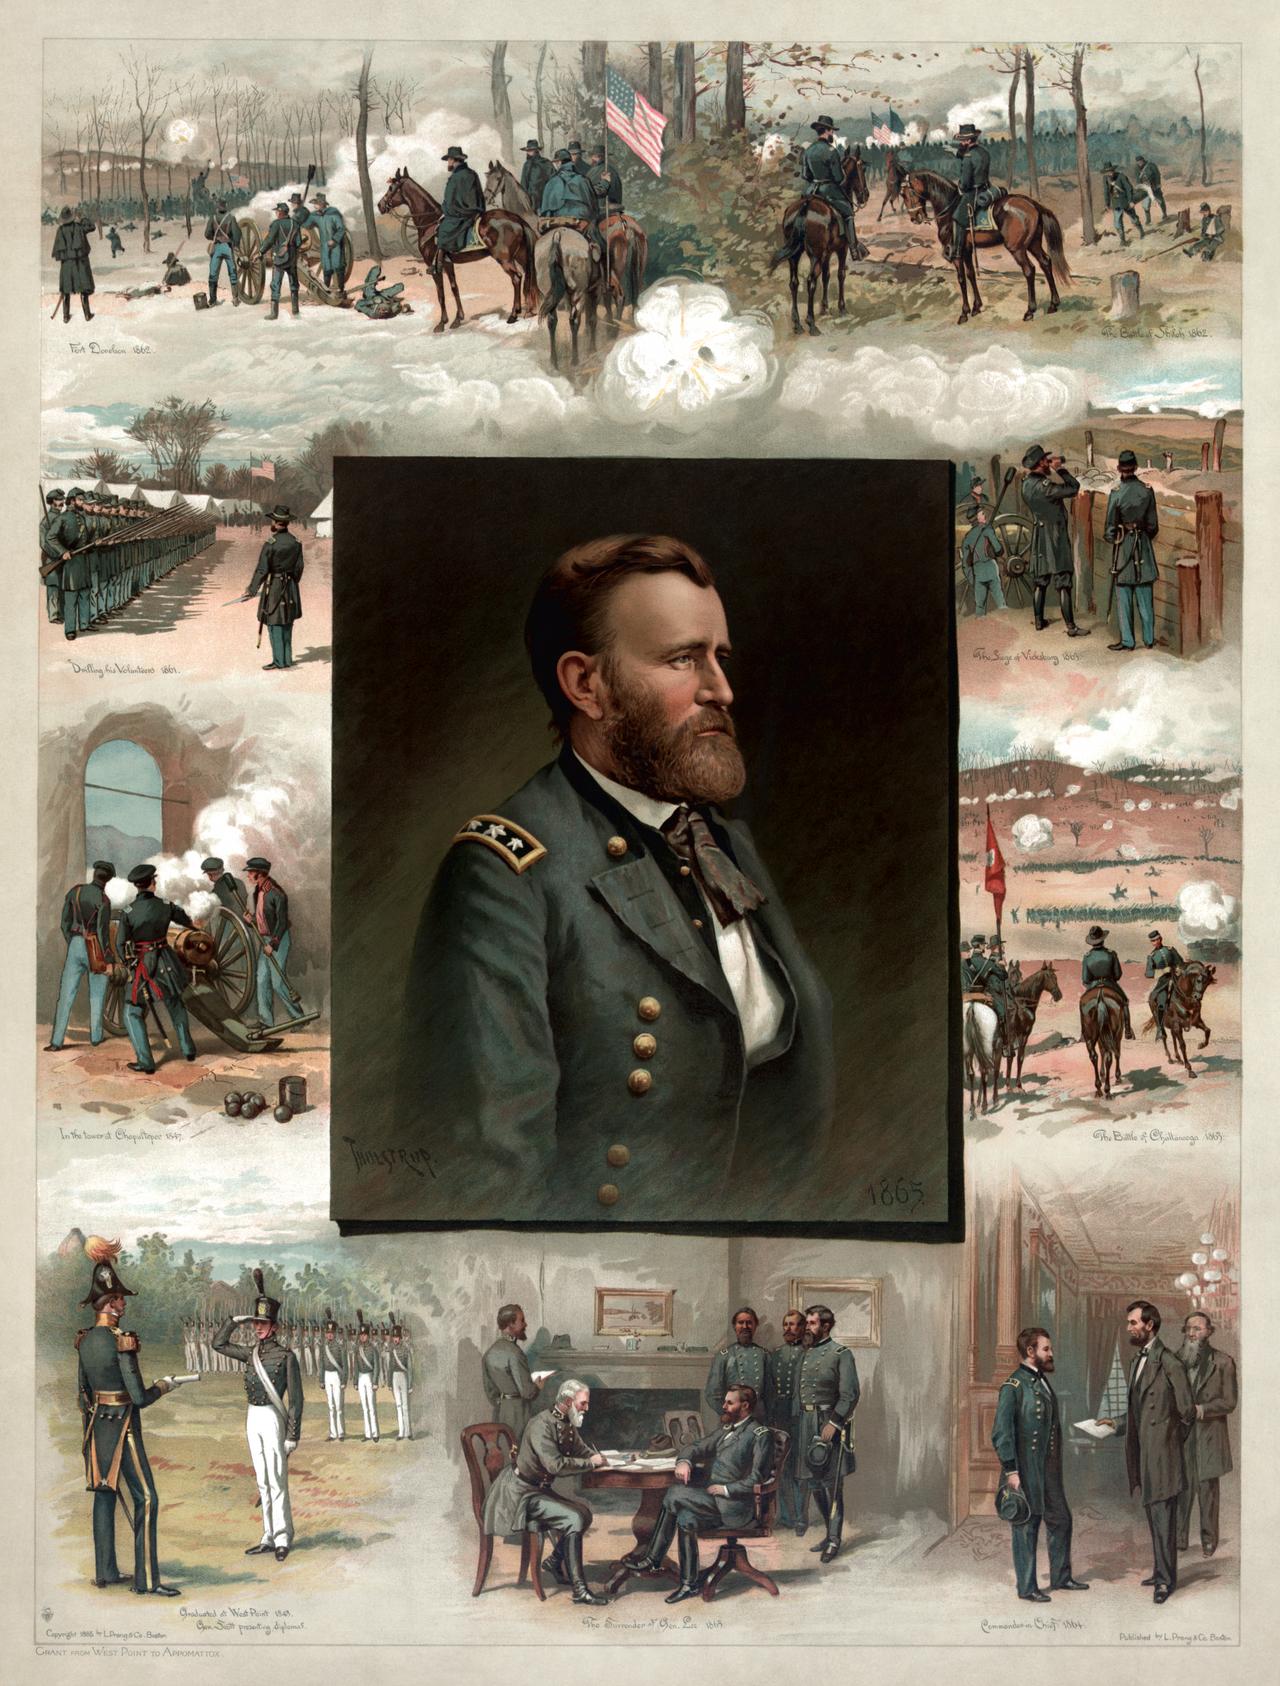 Ulysses S. Grant restoration by AdamCuerden